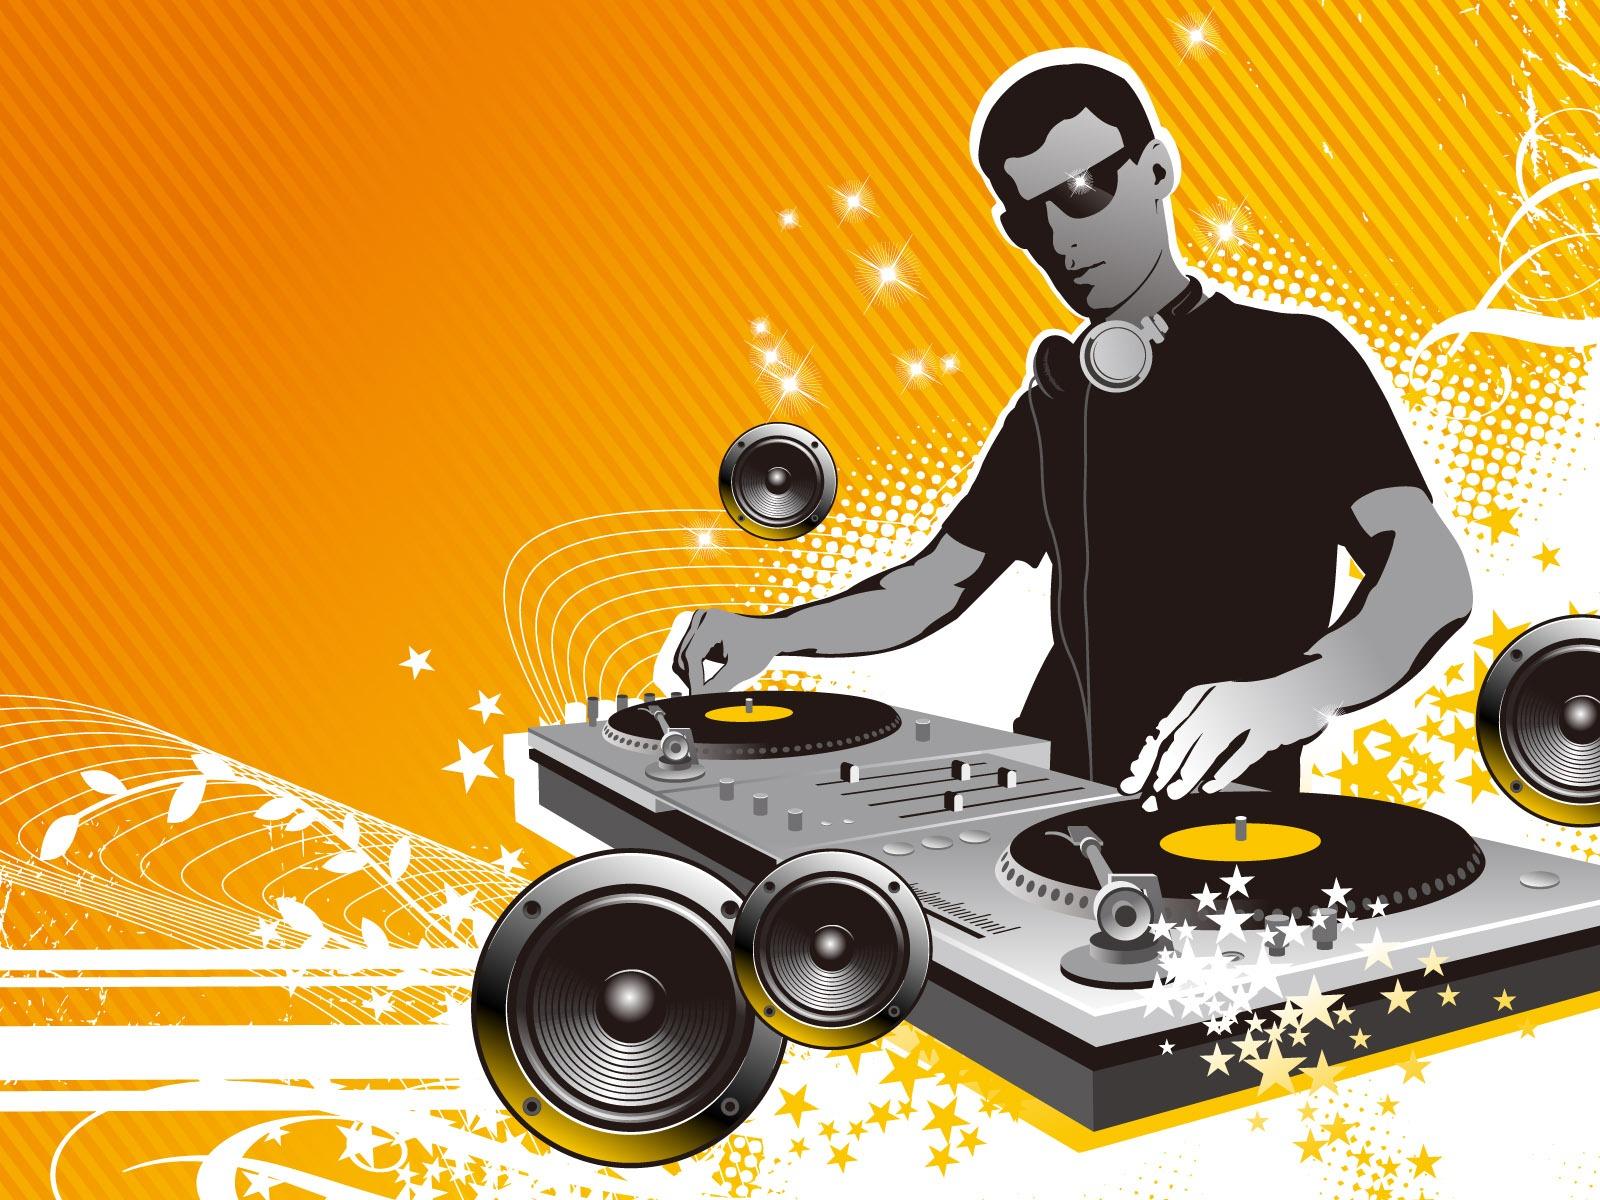 Club Music Life - Dj Mixing Wallpaper Hd - HD Wallpaper